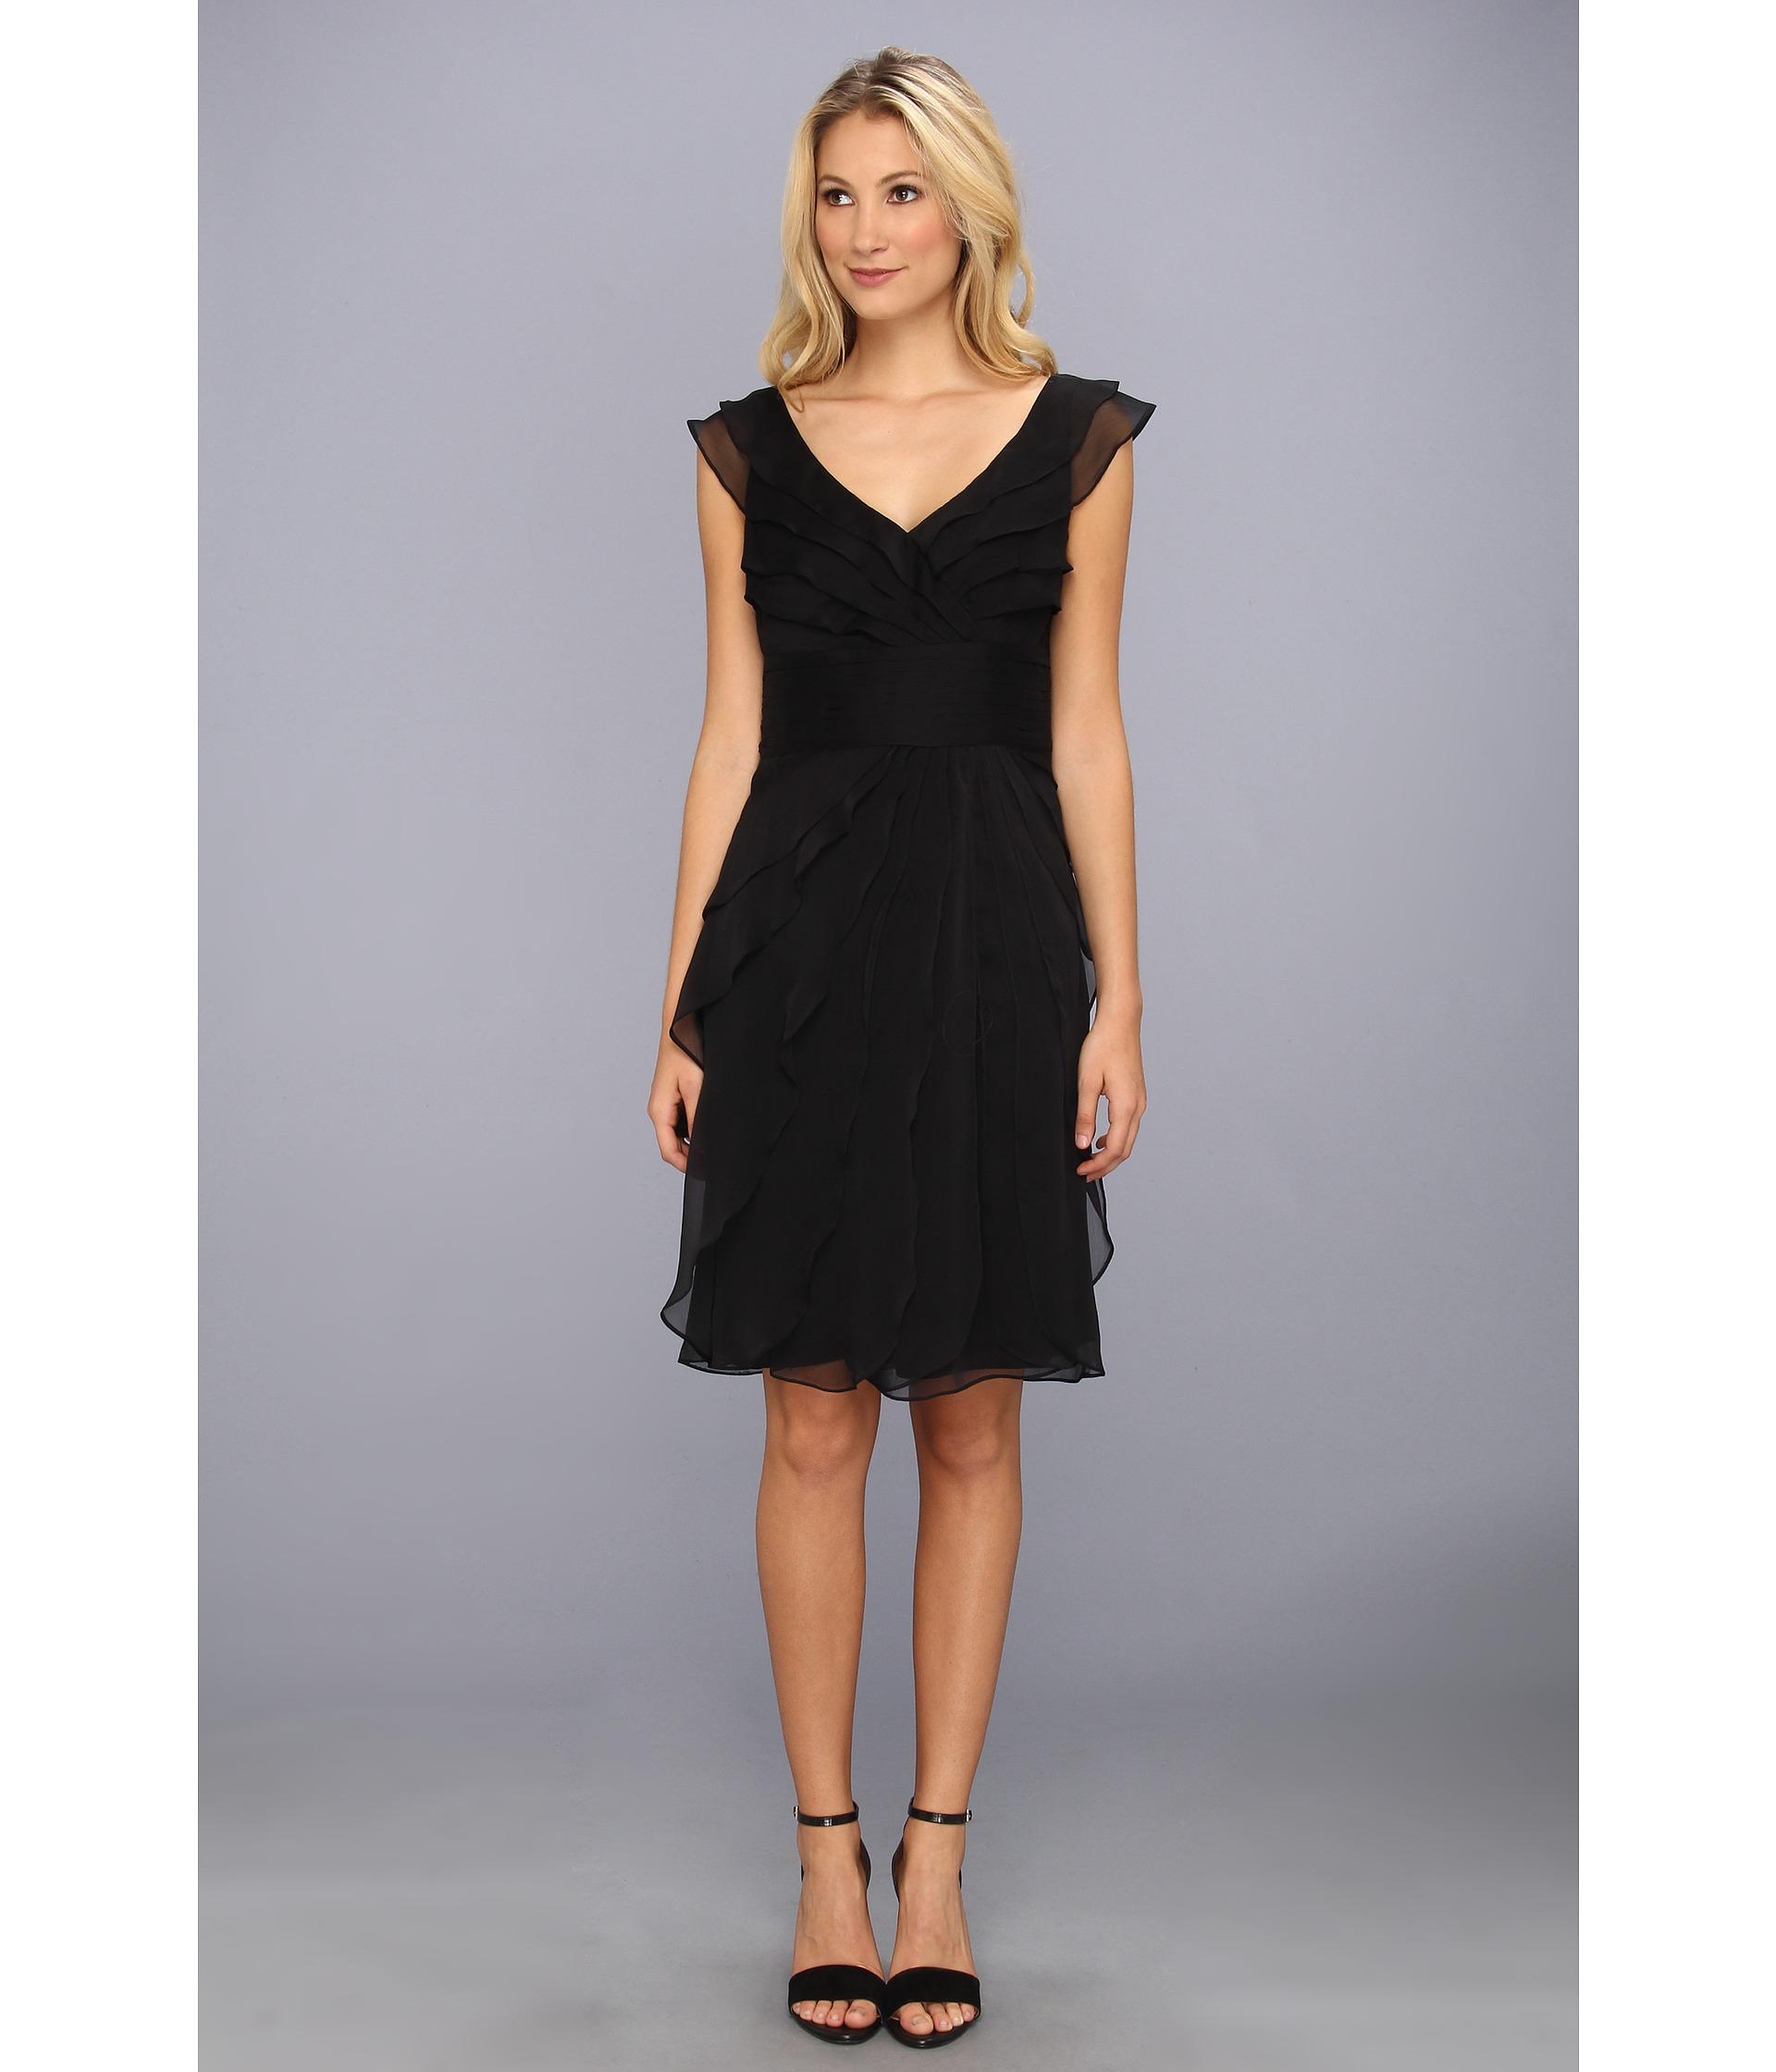 Beautiful Summer dresses blog: Black empire waist dresses